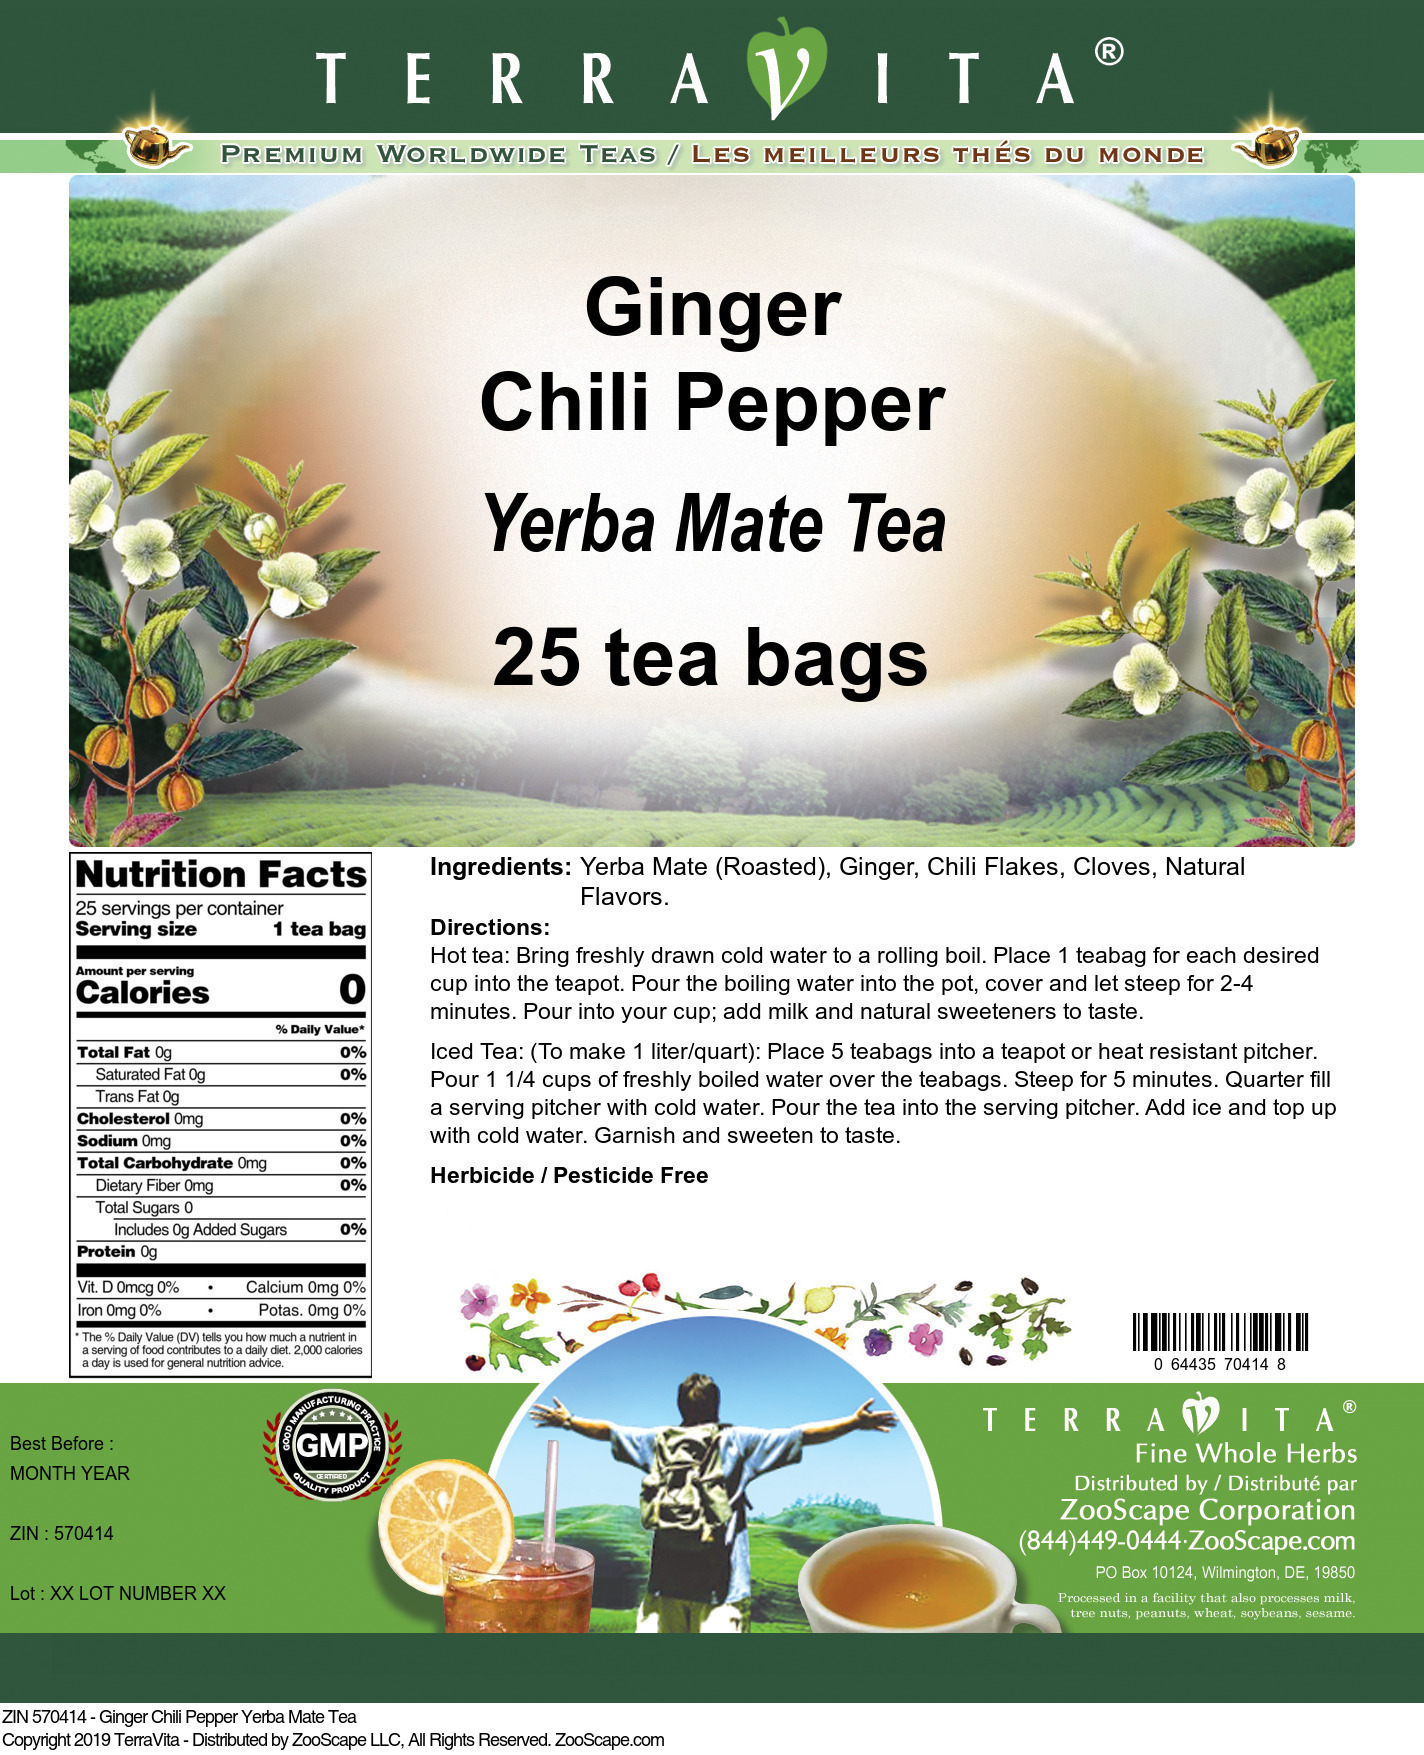 Ginger Chili Pepper Yerba Mate Tea